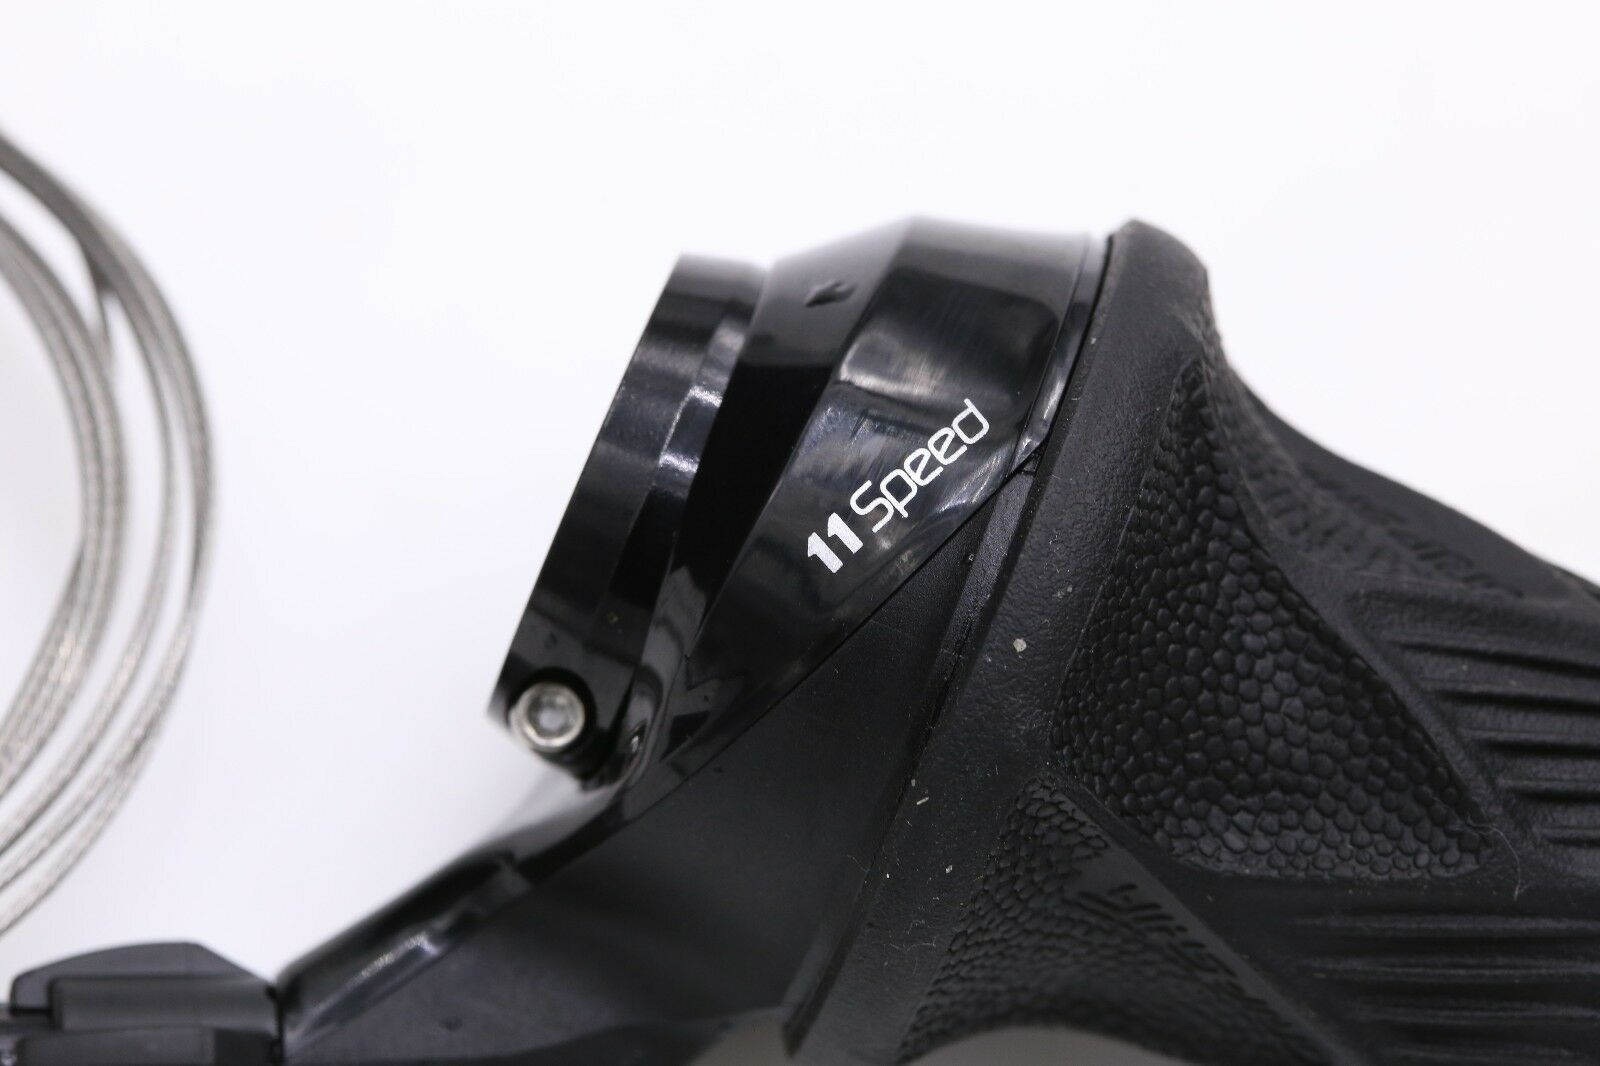 SRAM XX1 11 Speed Grip Twist Rear Right Shifter With Locking Grips